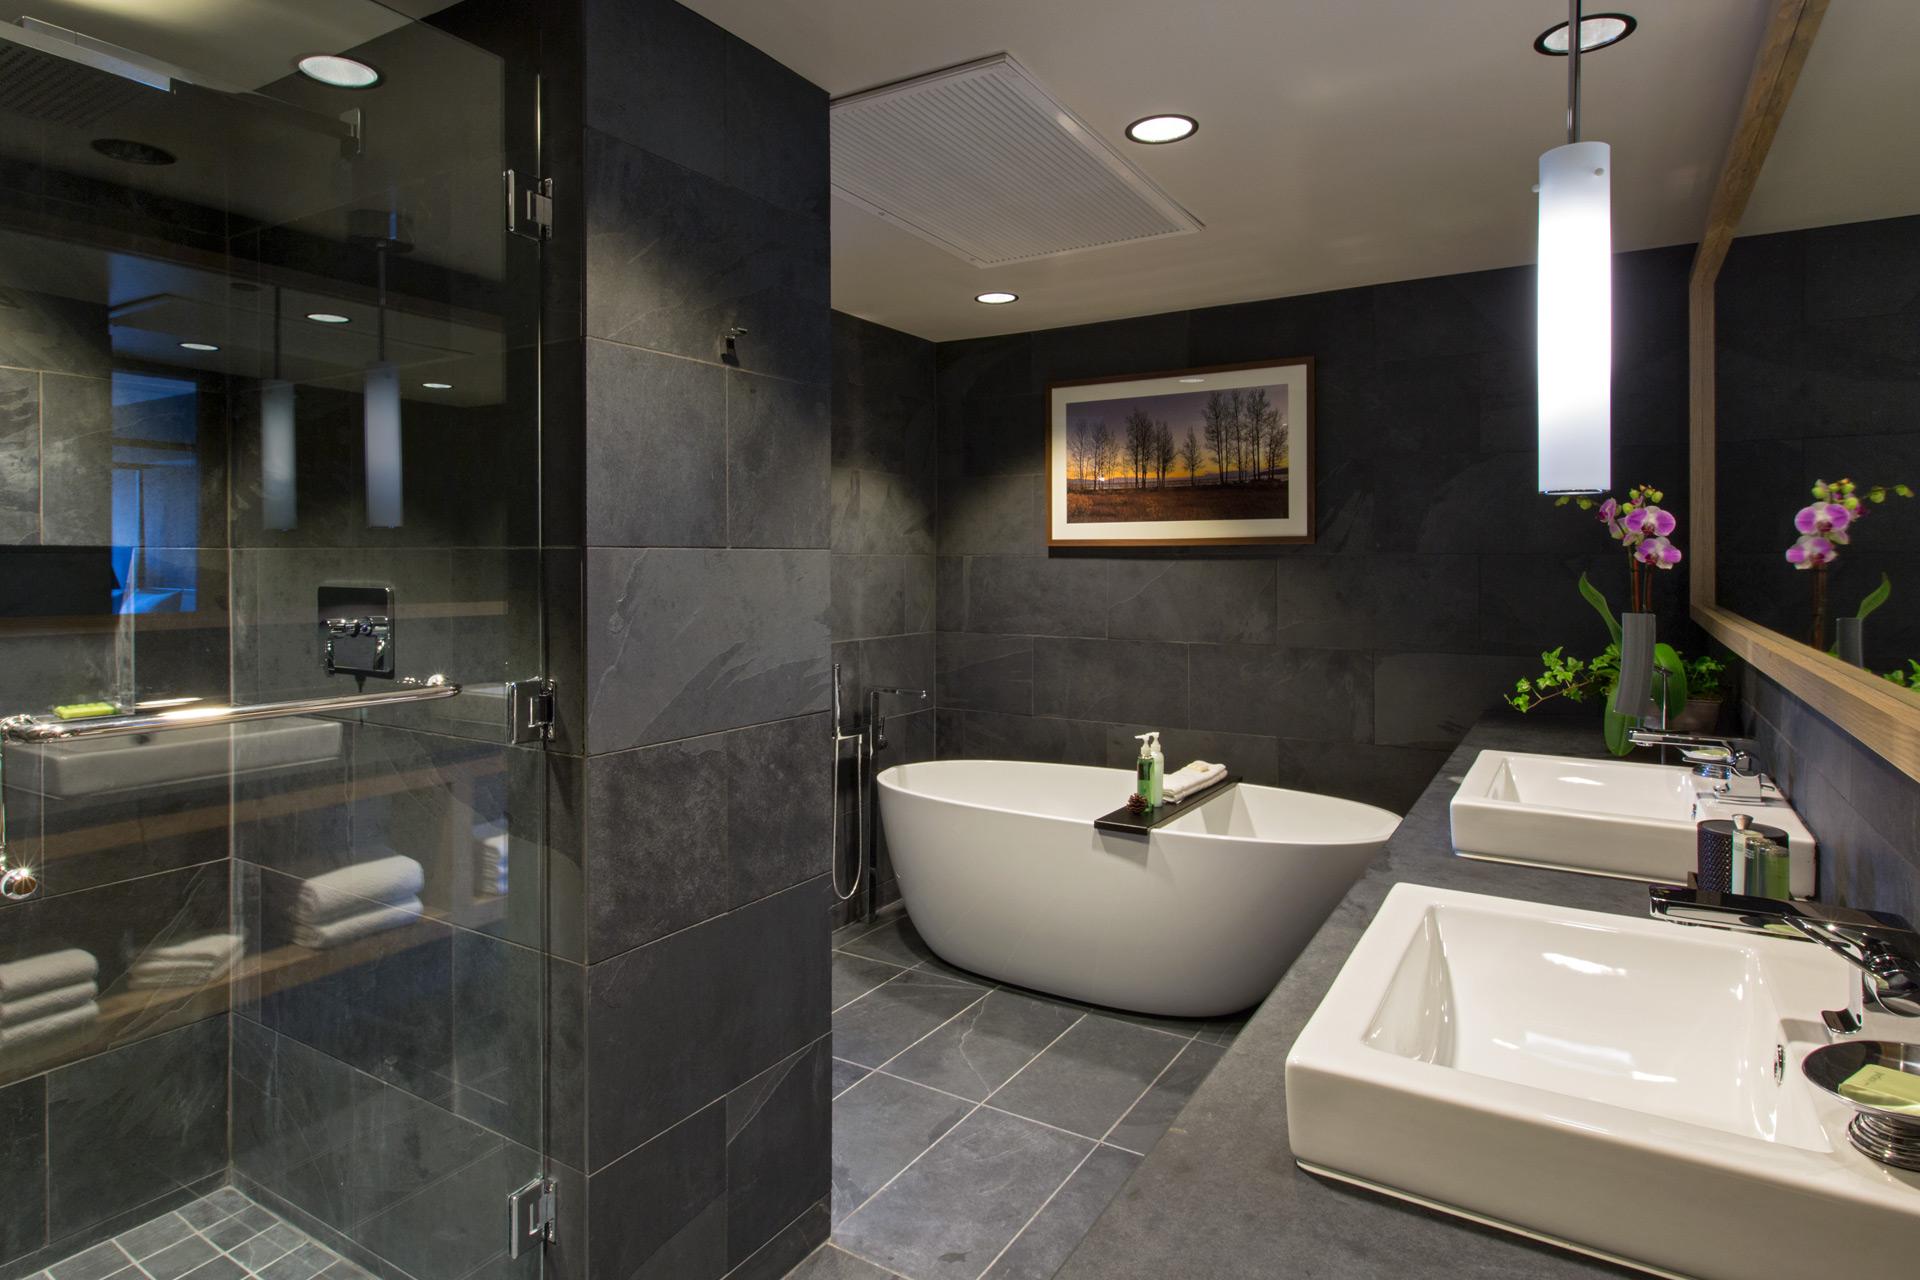 Hyatt Lake Tahoe Guestrooms decor ideas